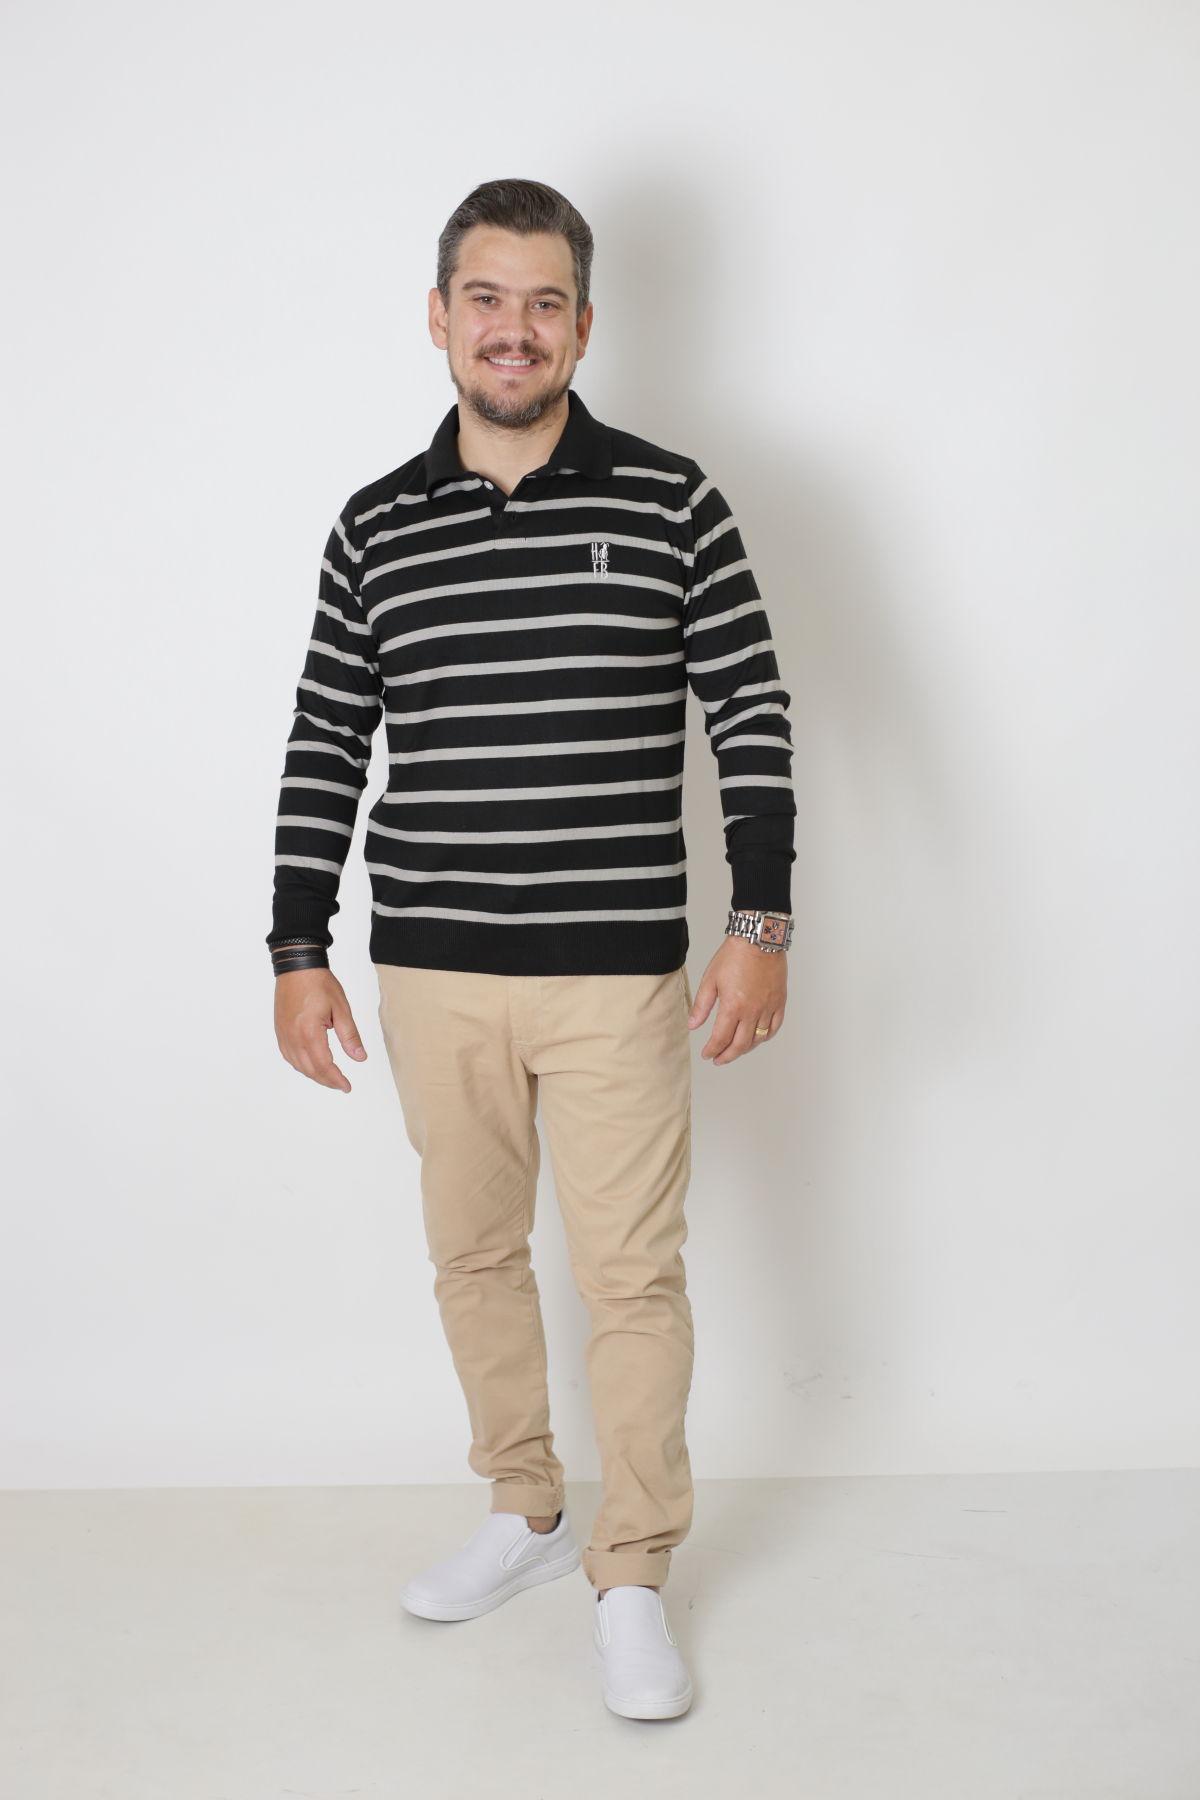 Camisa Polo Suéter Listrado Adulto  - Heitor Fashion Brazil